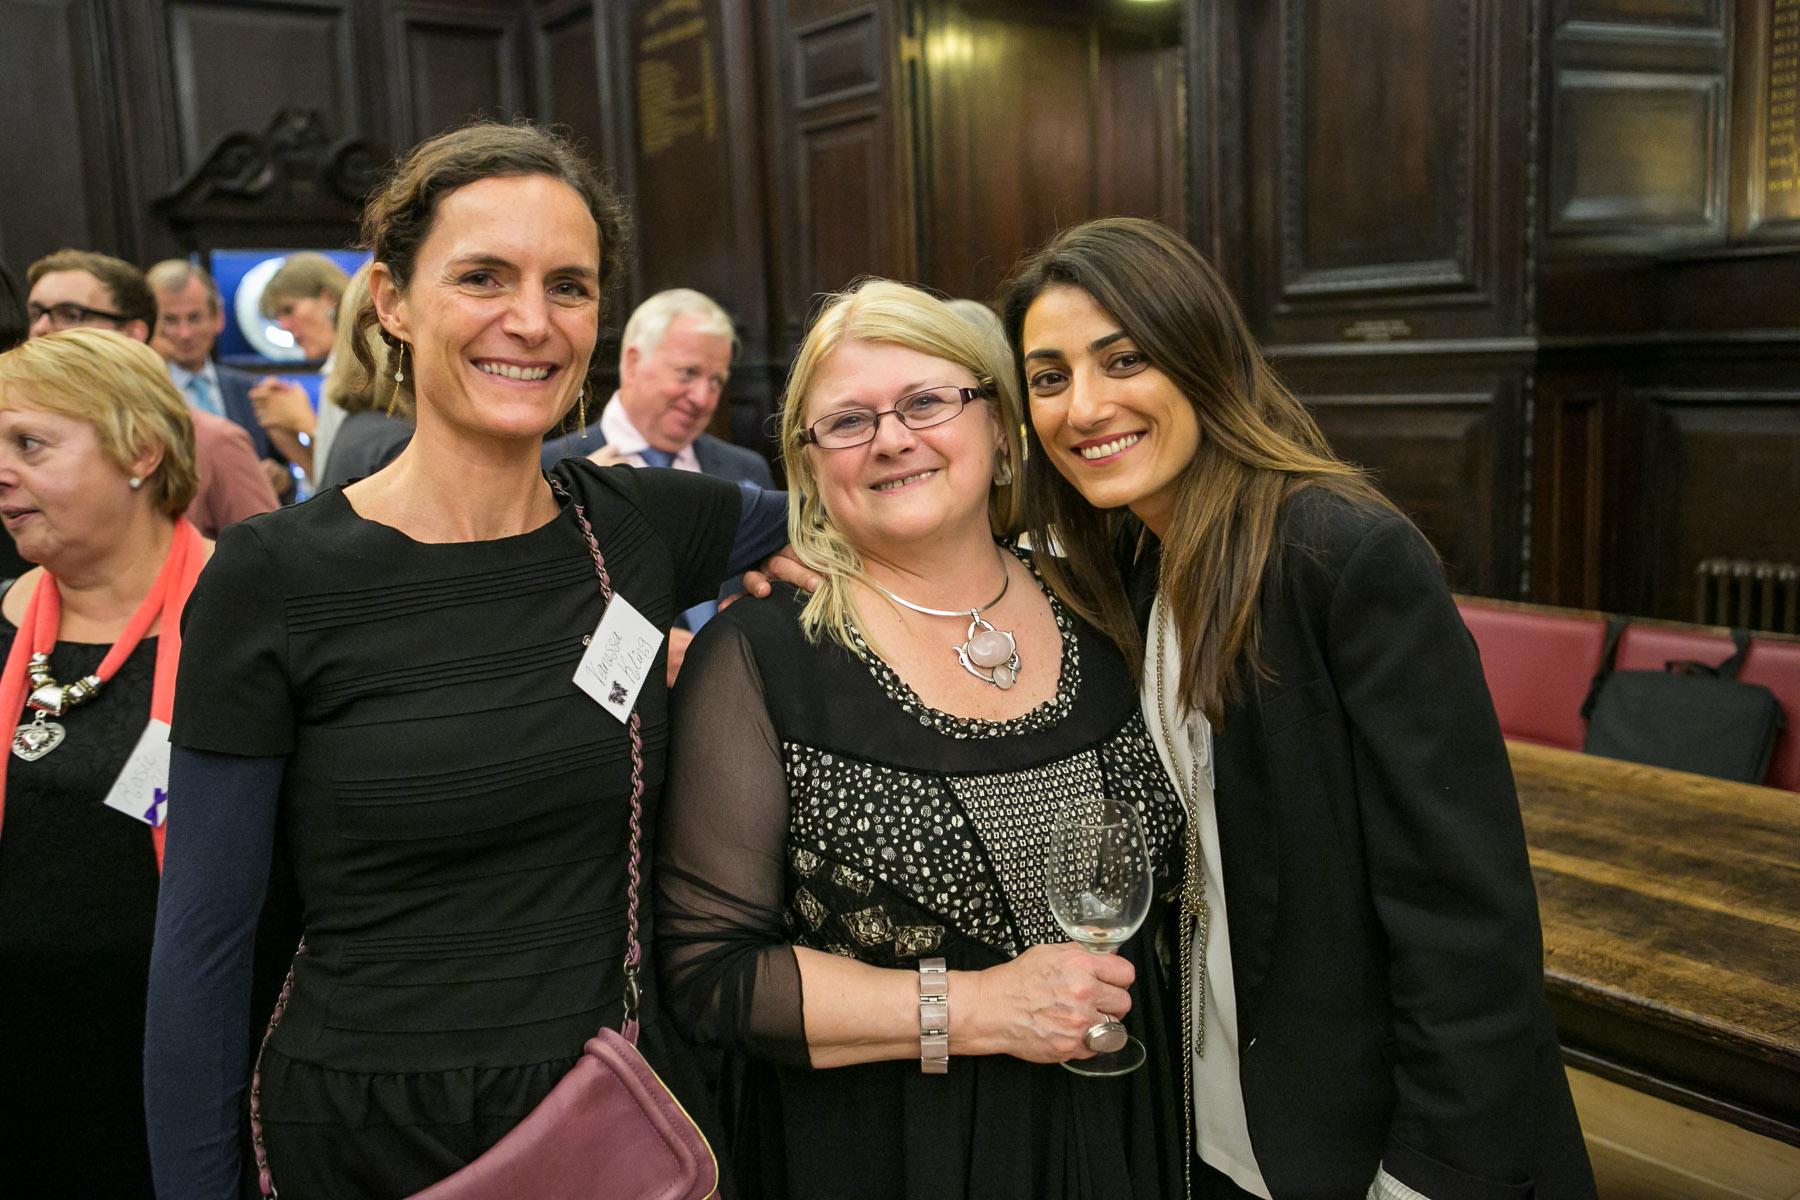 Vanessa Kling, Carole Blake, Michele Kanonidis